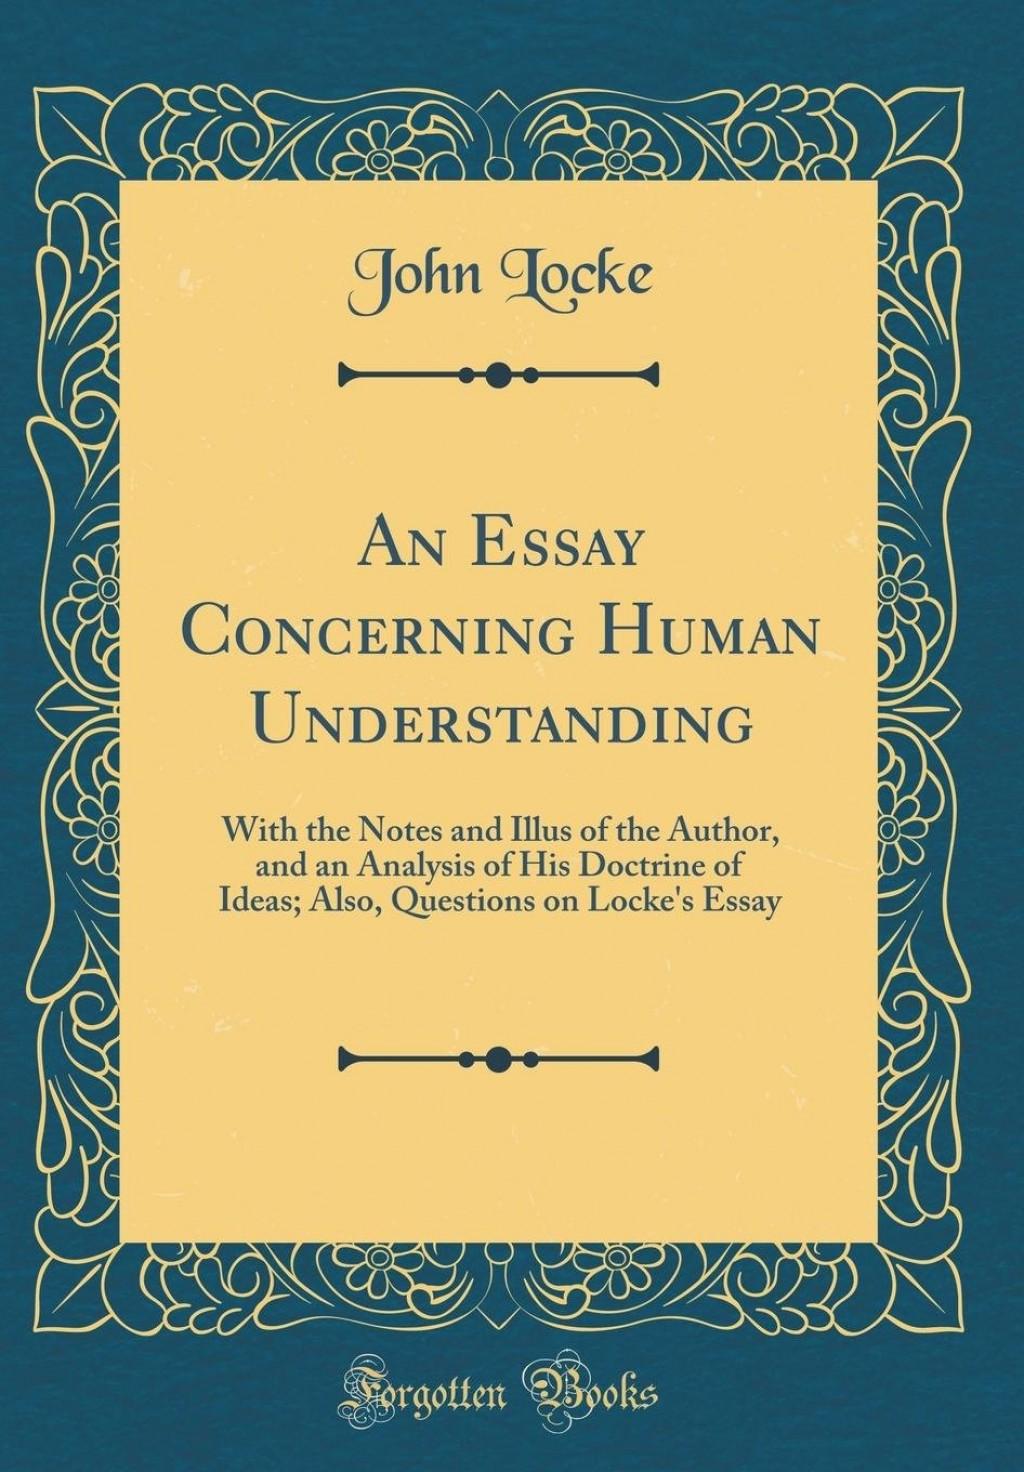 021 71zeizuftol John Locke Essay Impressive Concerning Human Understanding Book 4 On Pdf Summary Large